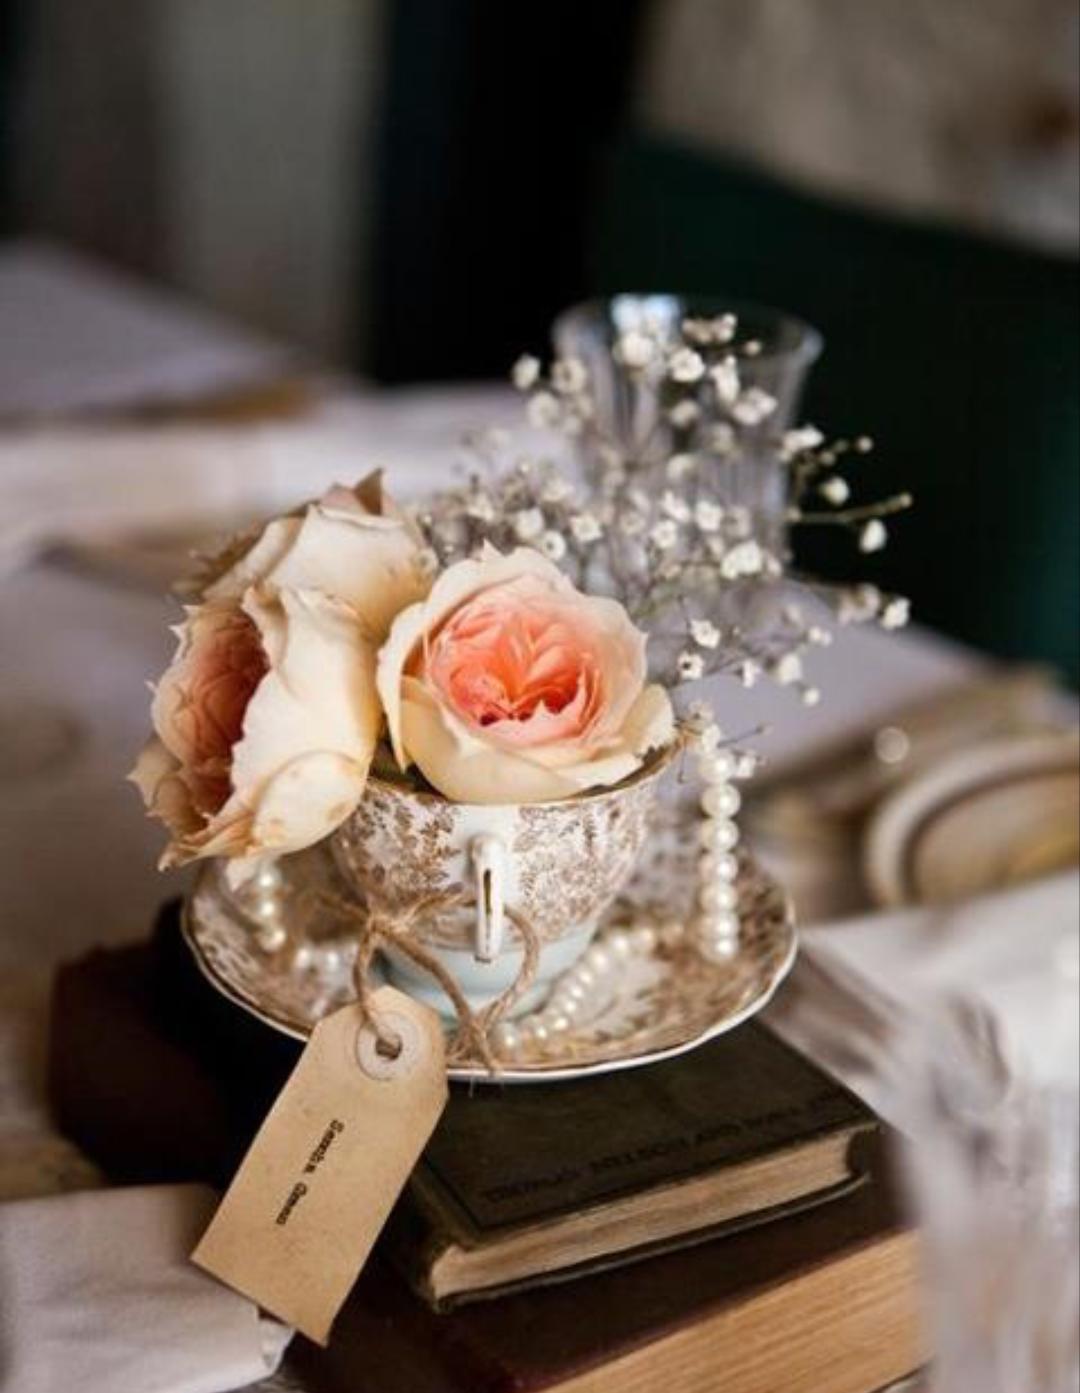 Wondrous Wedding Reception Decor Roses Tea Cups Old Books Pearls Download Free Architecture Designs Scobabritishbridgeorg